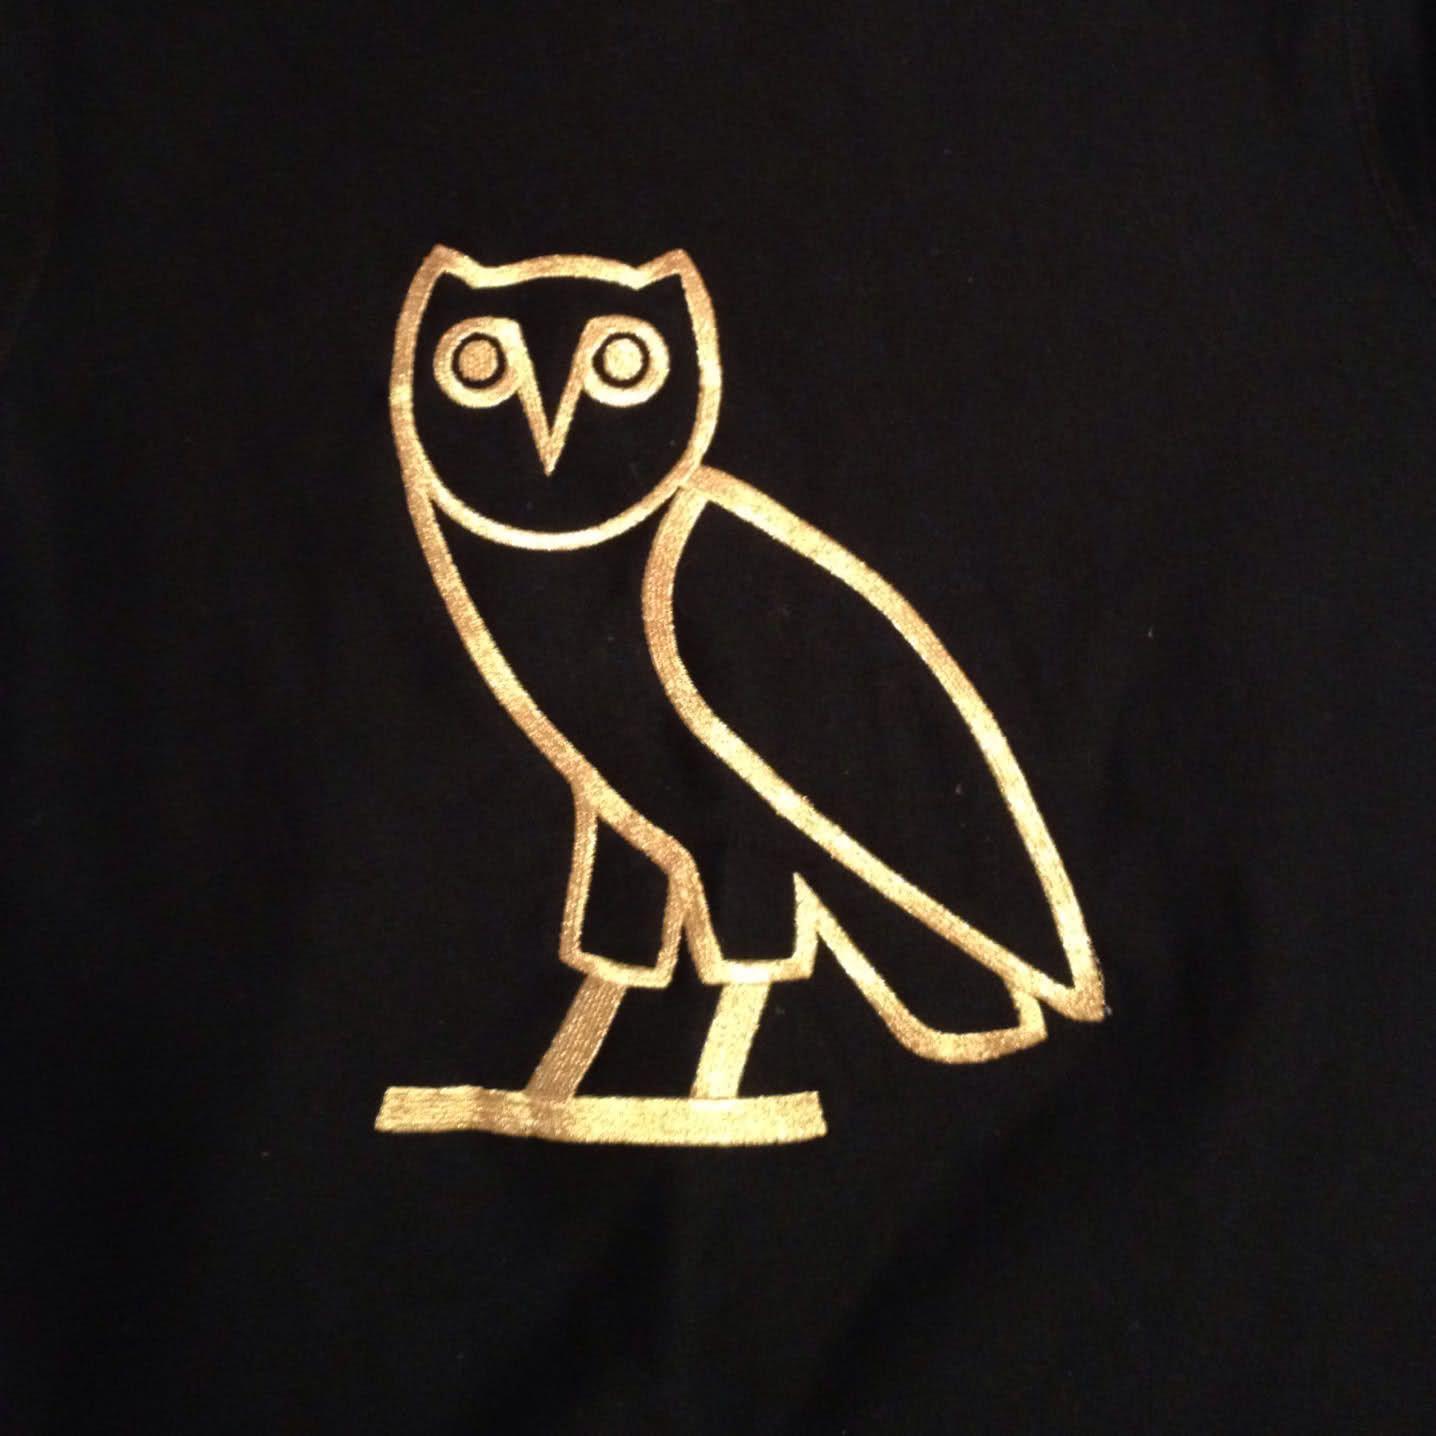 Drake Owl Wallpapers Top Free Drake Owl Backgrounds Wallpaperaccess